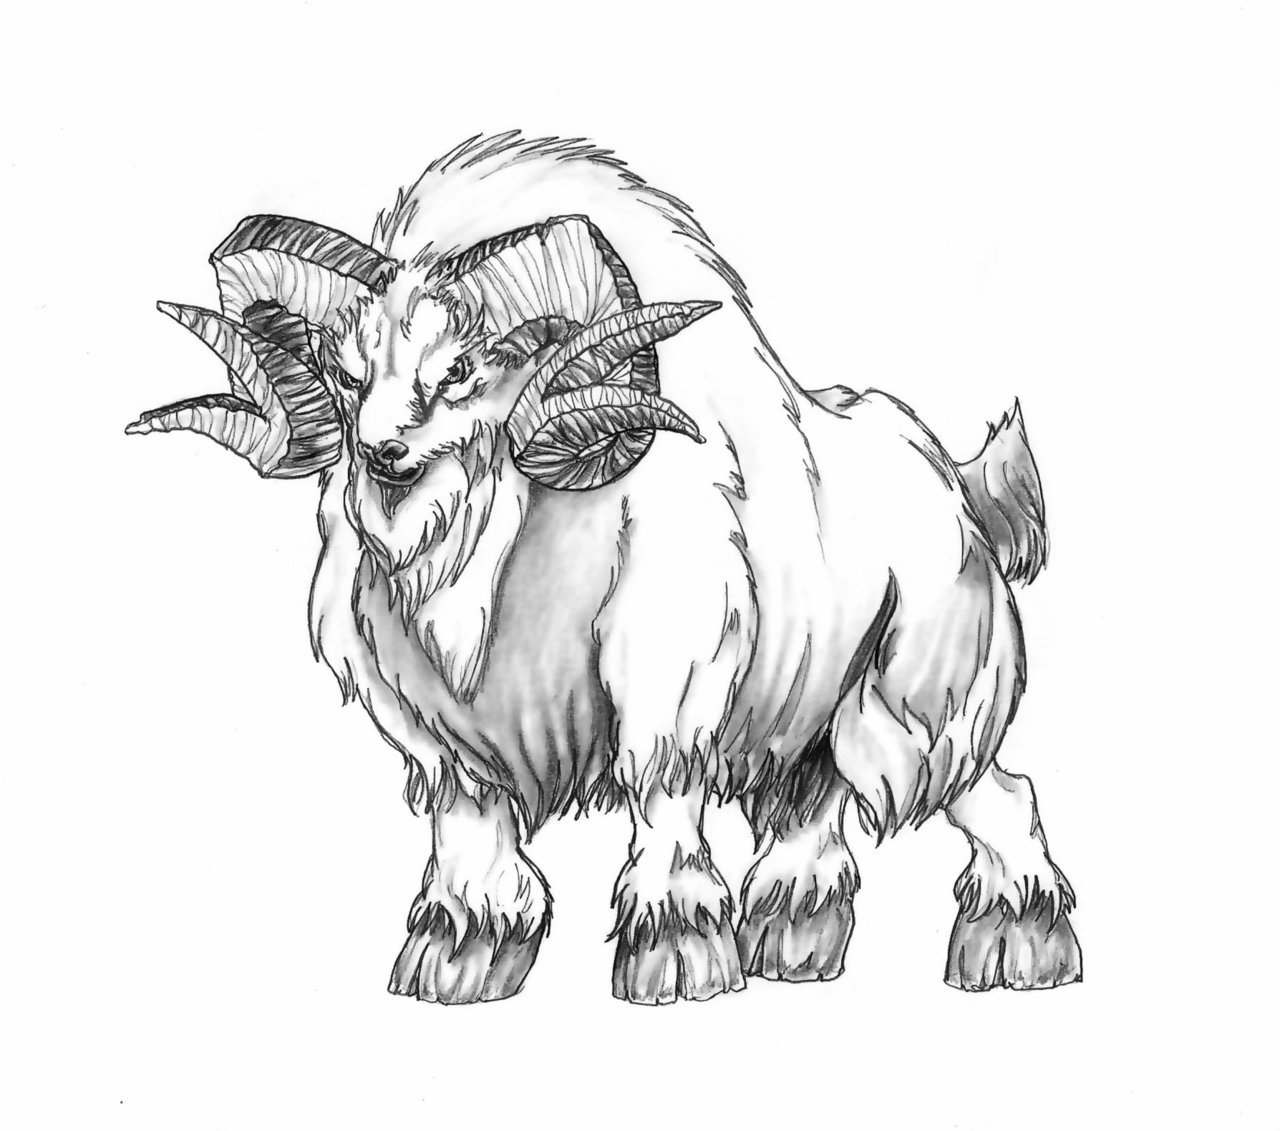 1280x1131 Dire Ram By Butterfrog